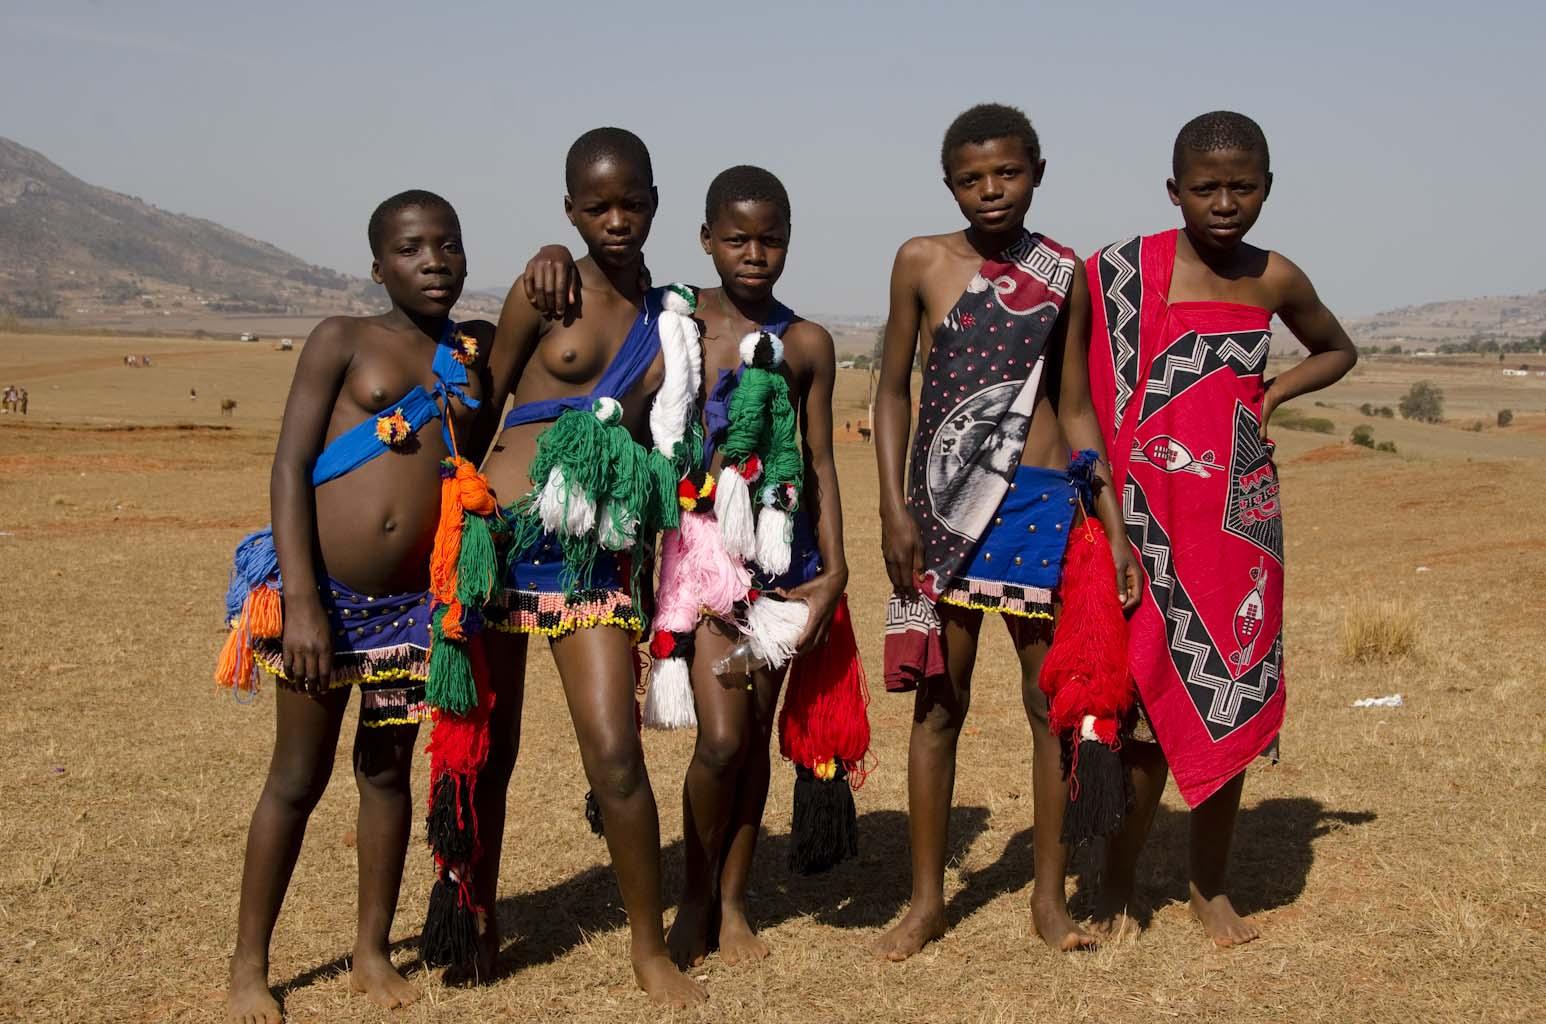 Swaziland babes